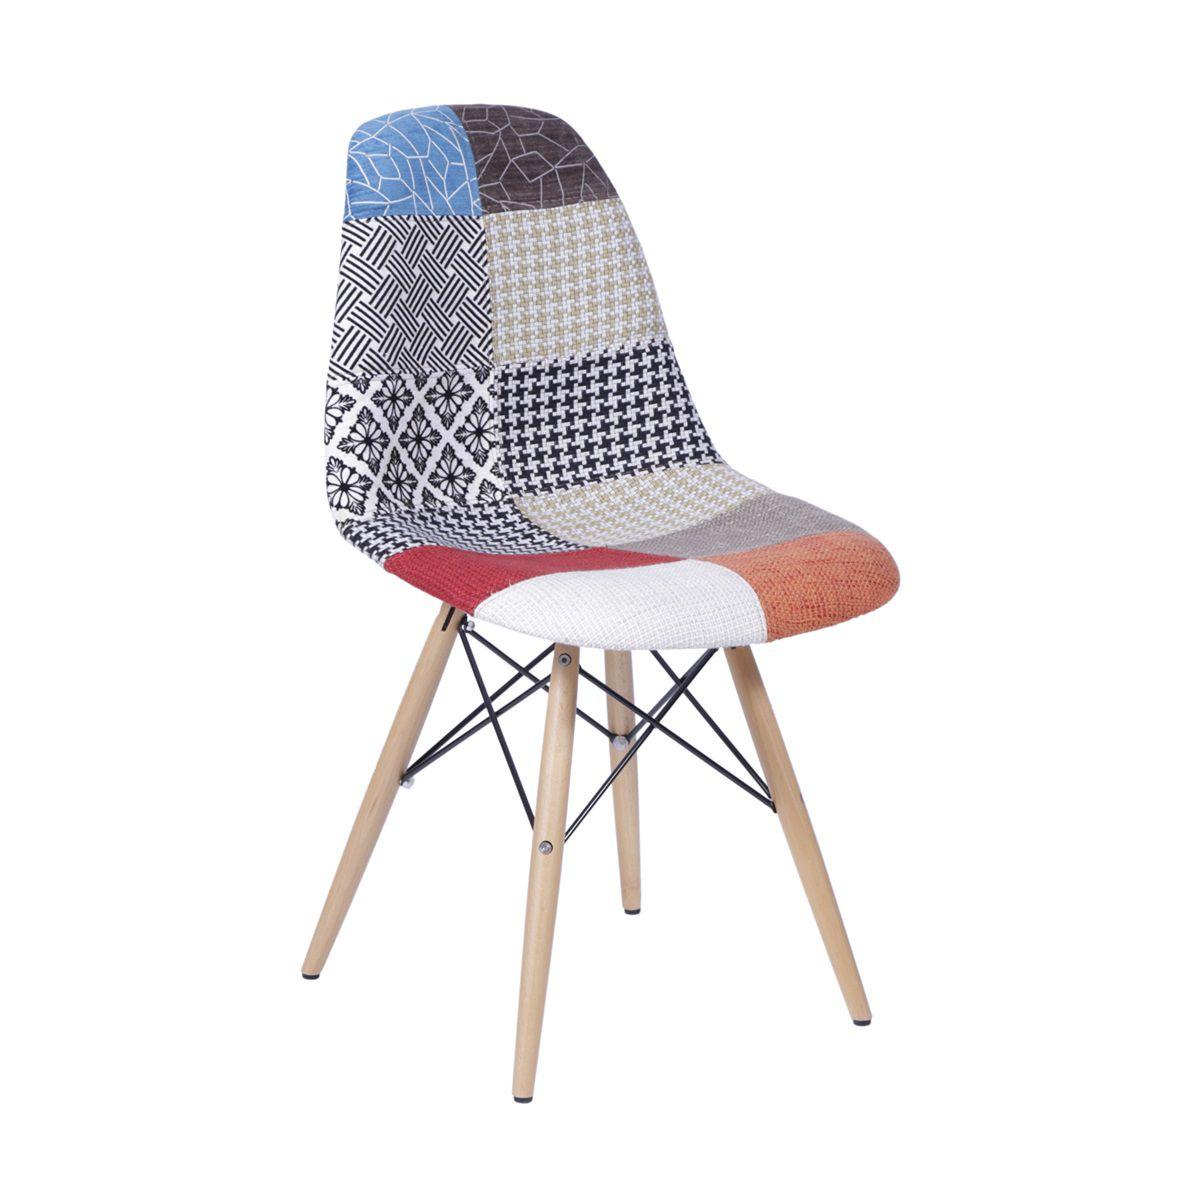 Cadeira Eames DSW Patchwork Base Eiffel Madeira